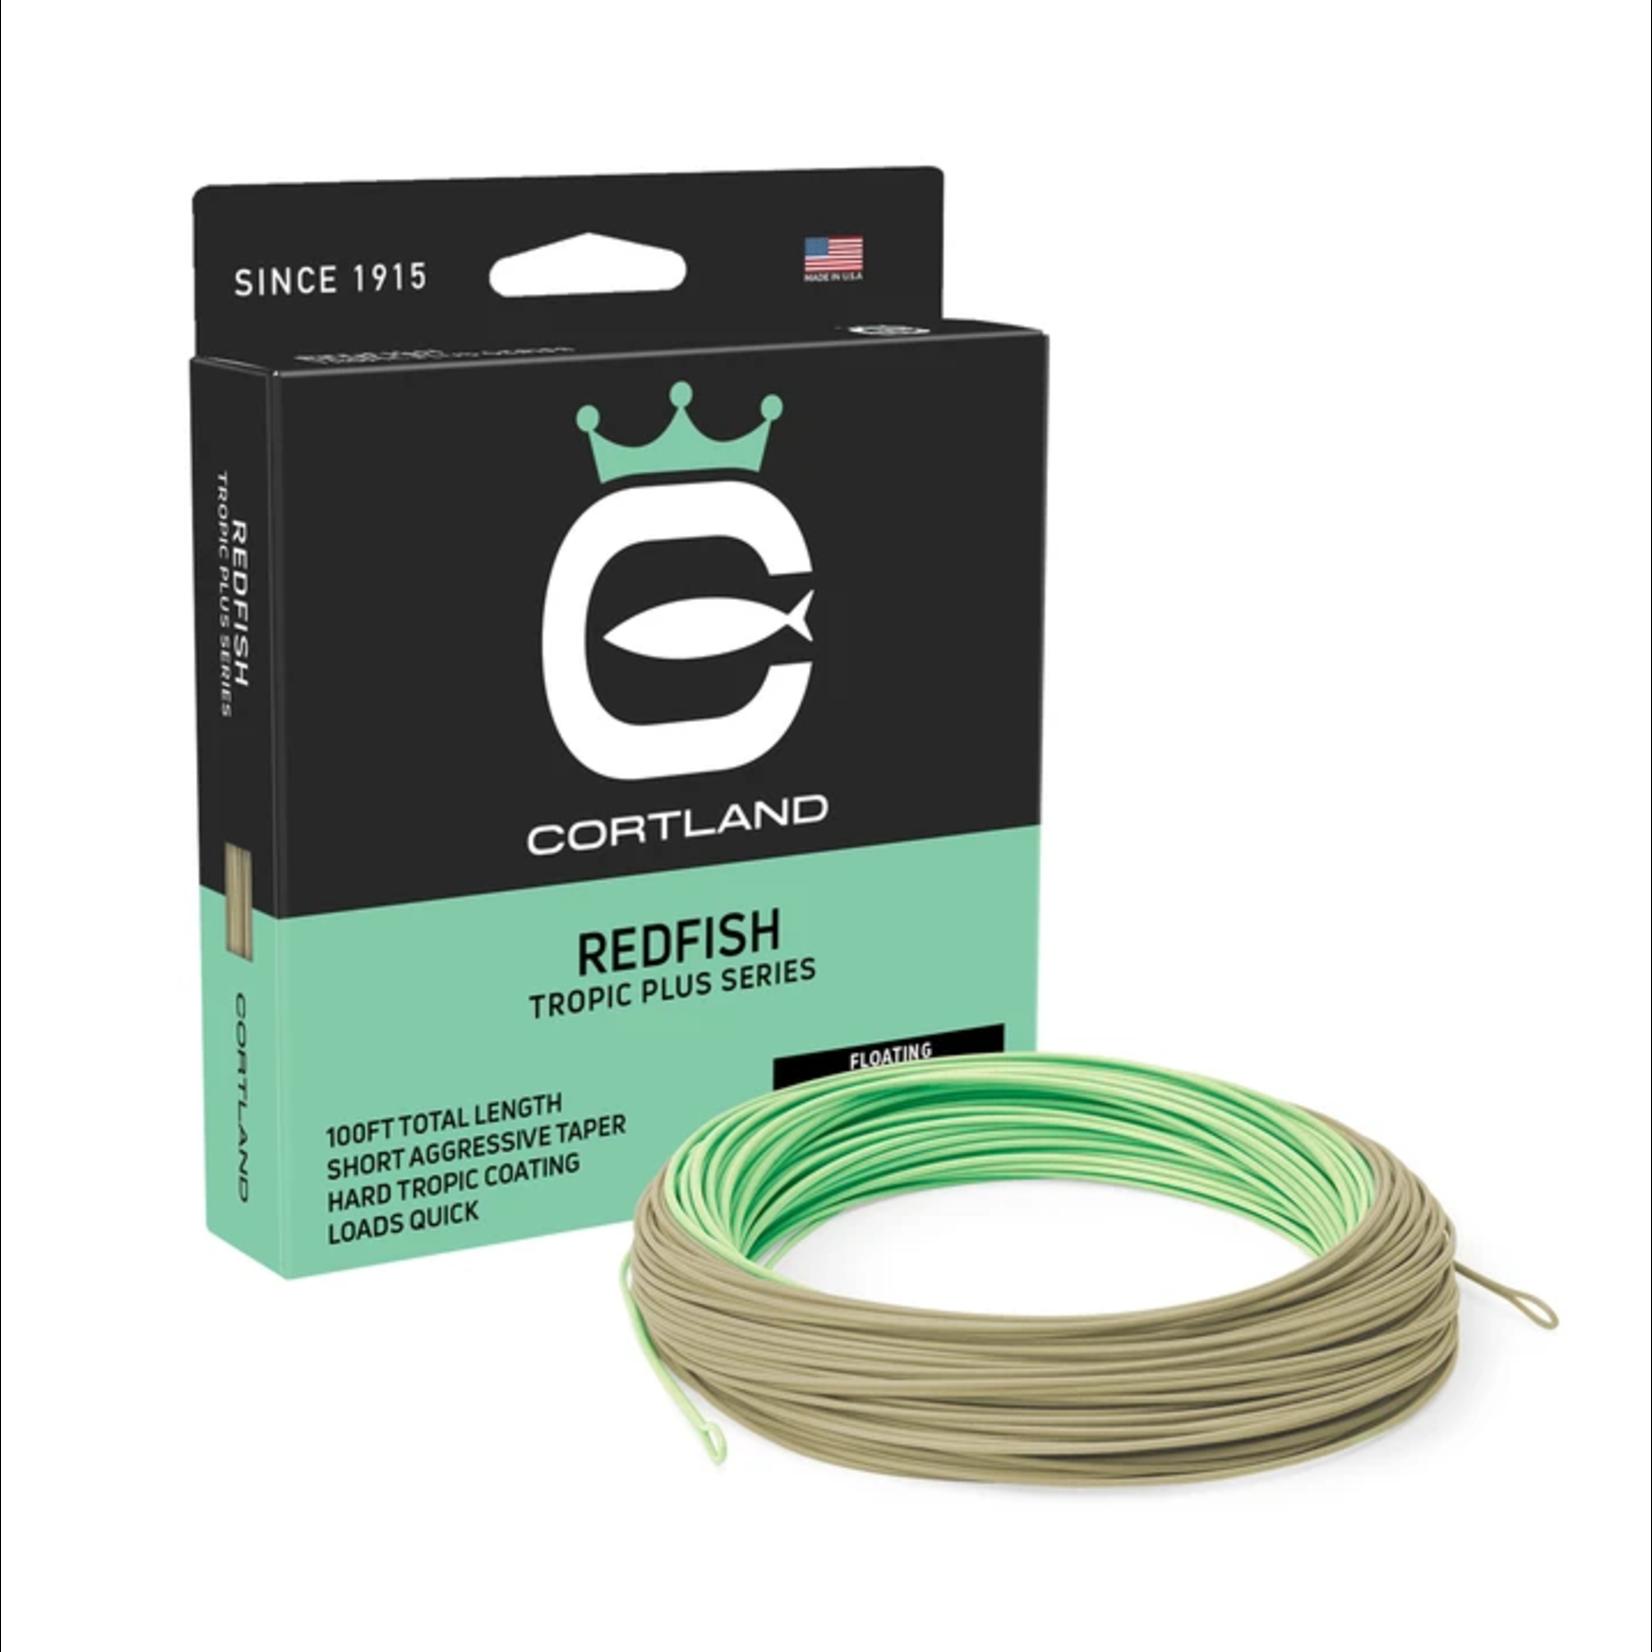 Cortland | Tropic Plus Series Redfish 8wt